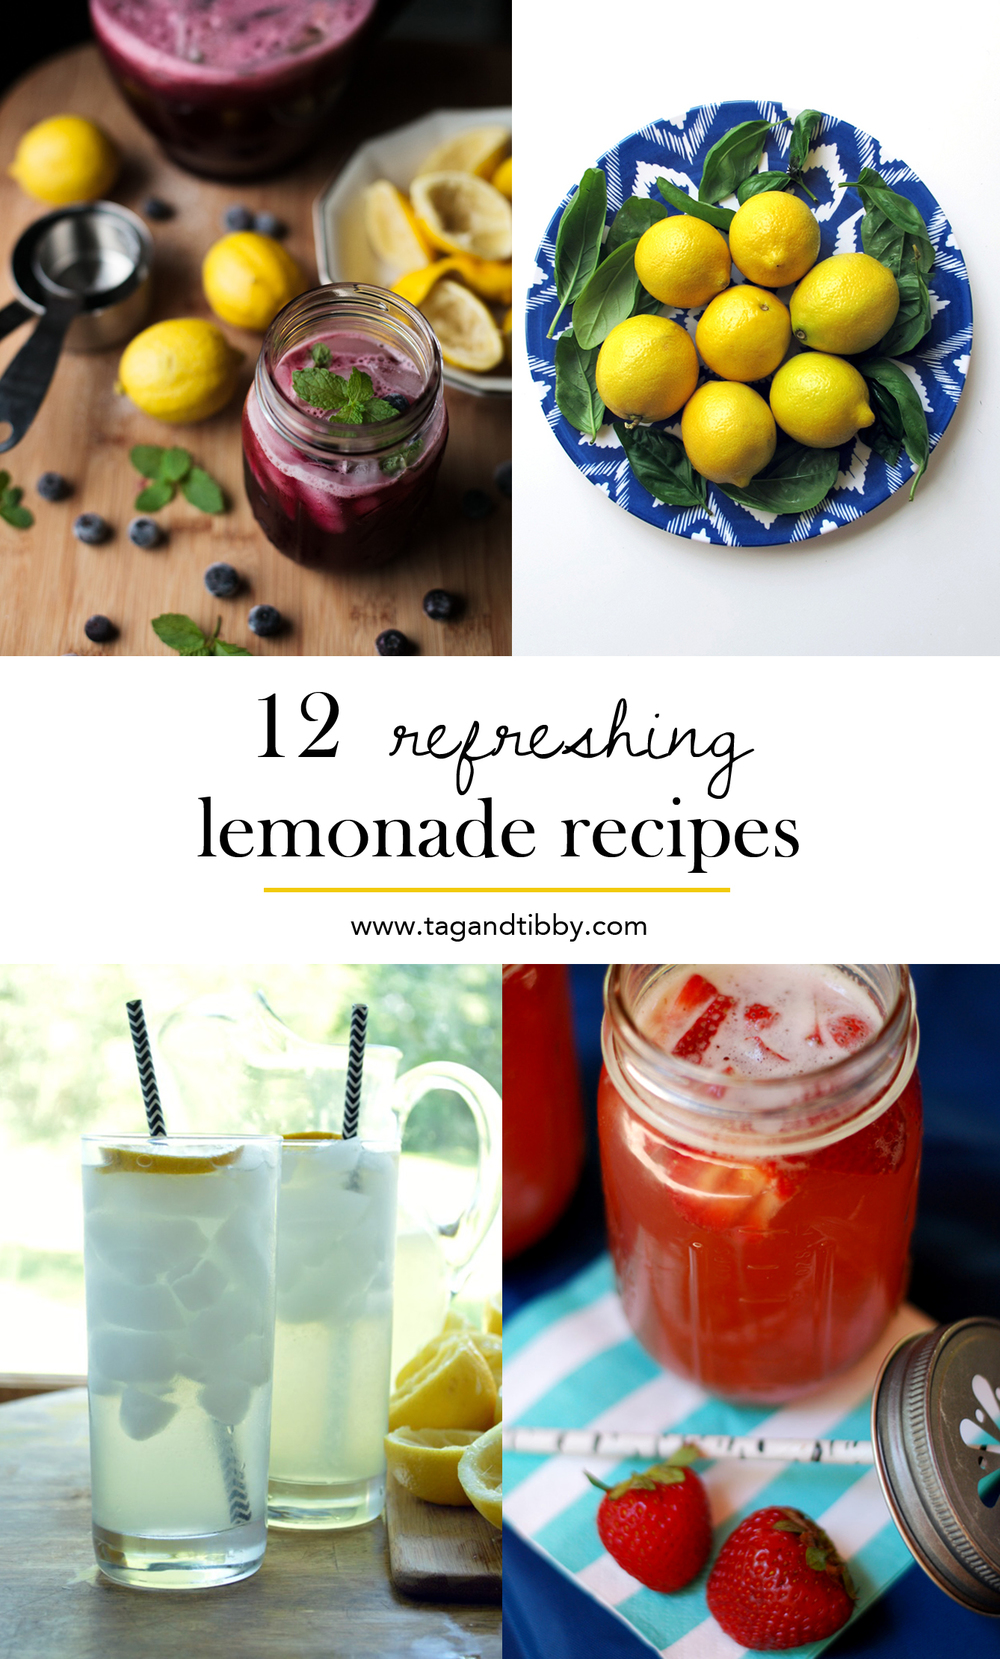 12 refreshing homemade lemonade recipes, perfect on a hot summer day!